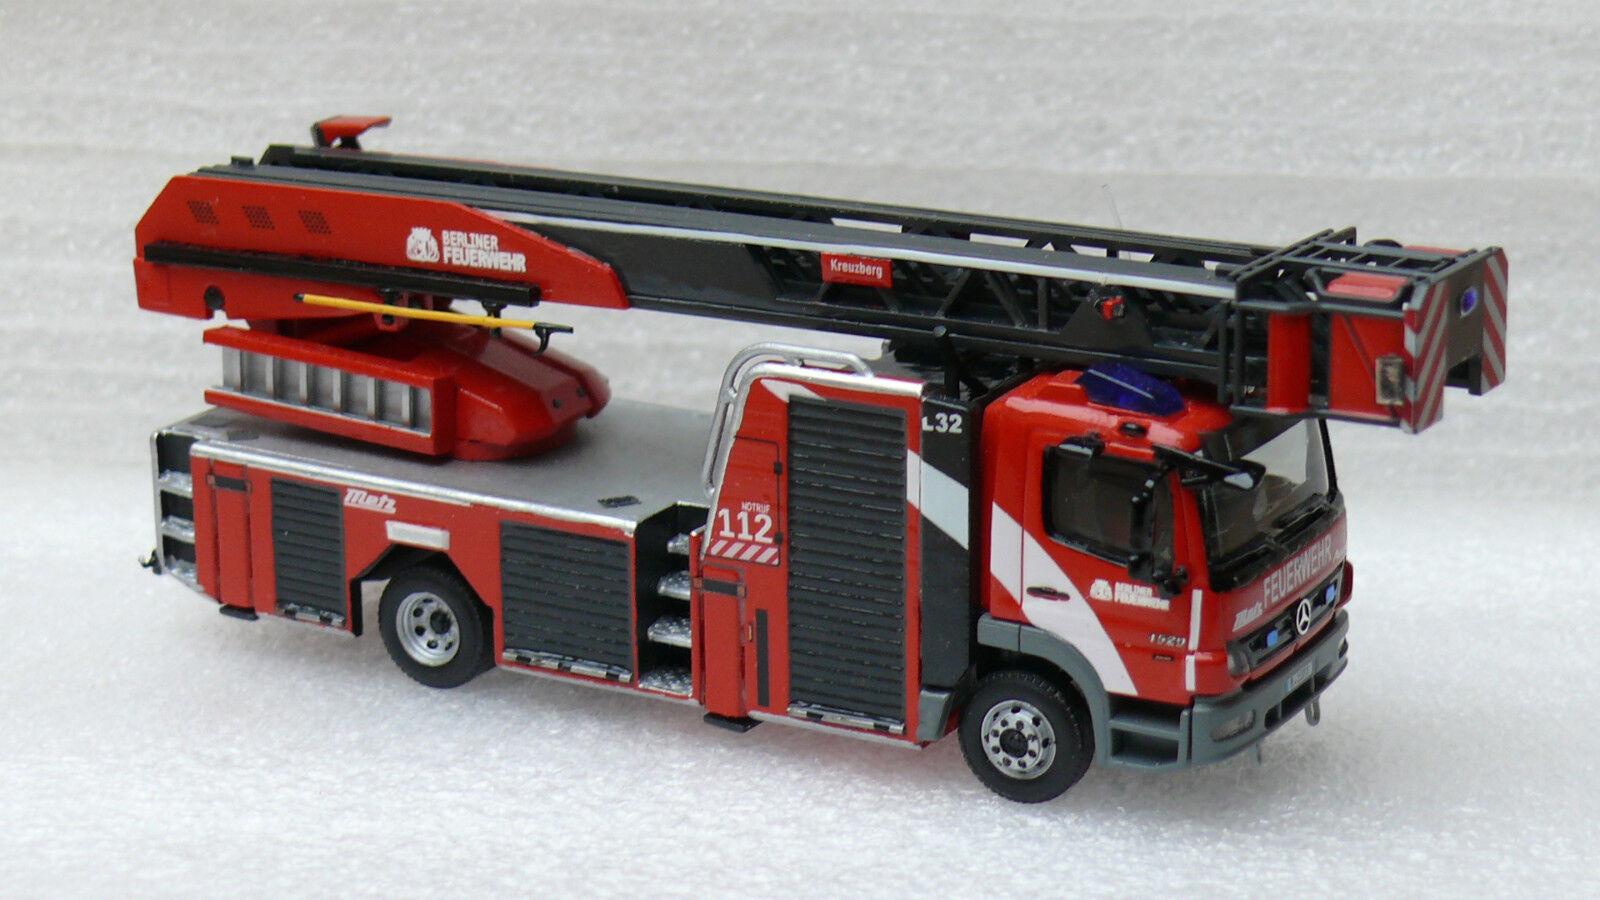 Pompiers Berlin prescripteurs 23-12 Mo Atego 1529 F construction Metz  l32  Corporate Design h0